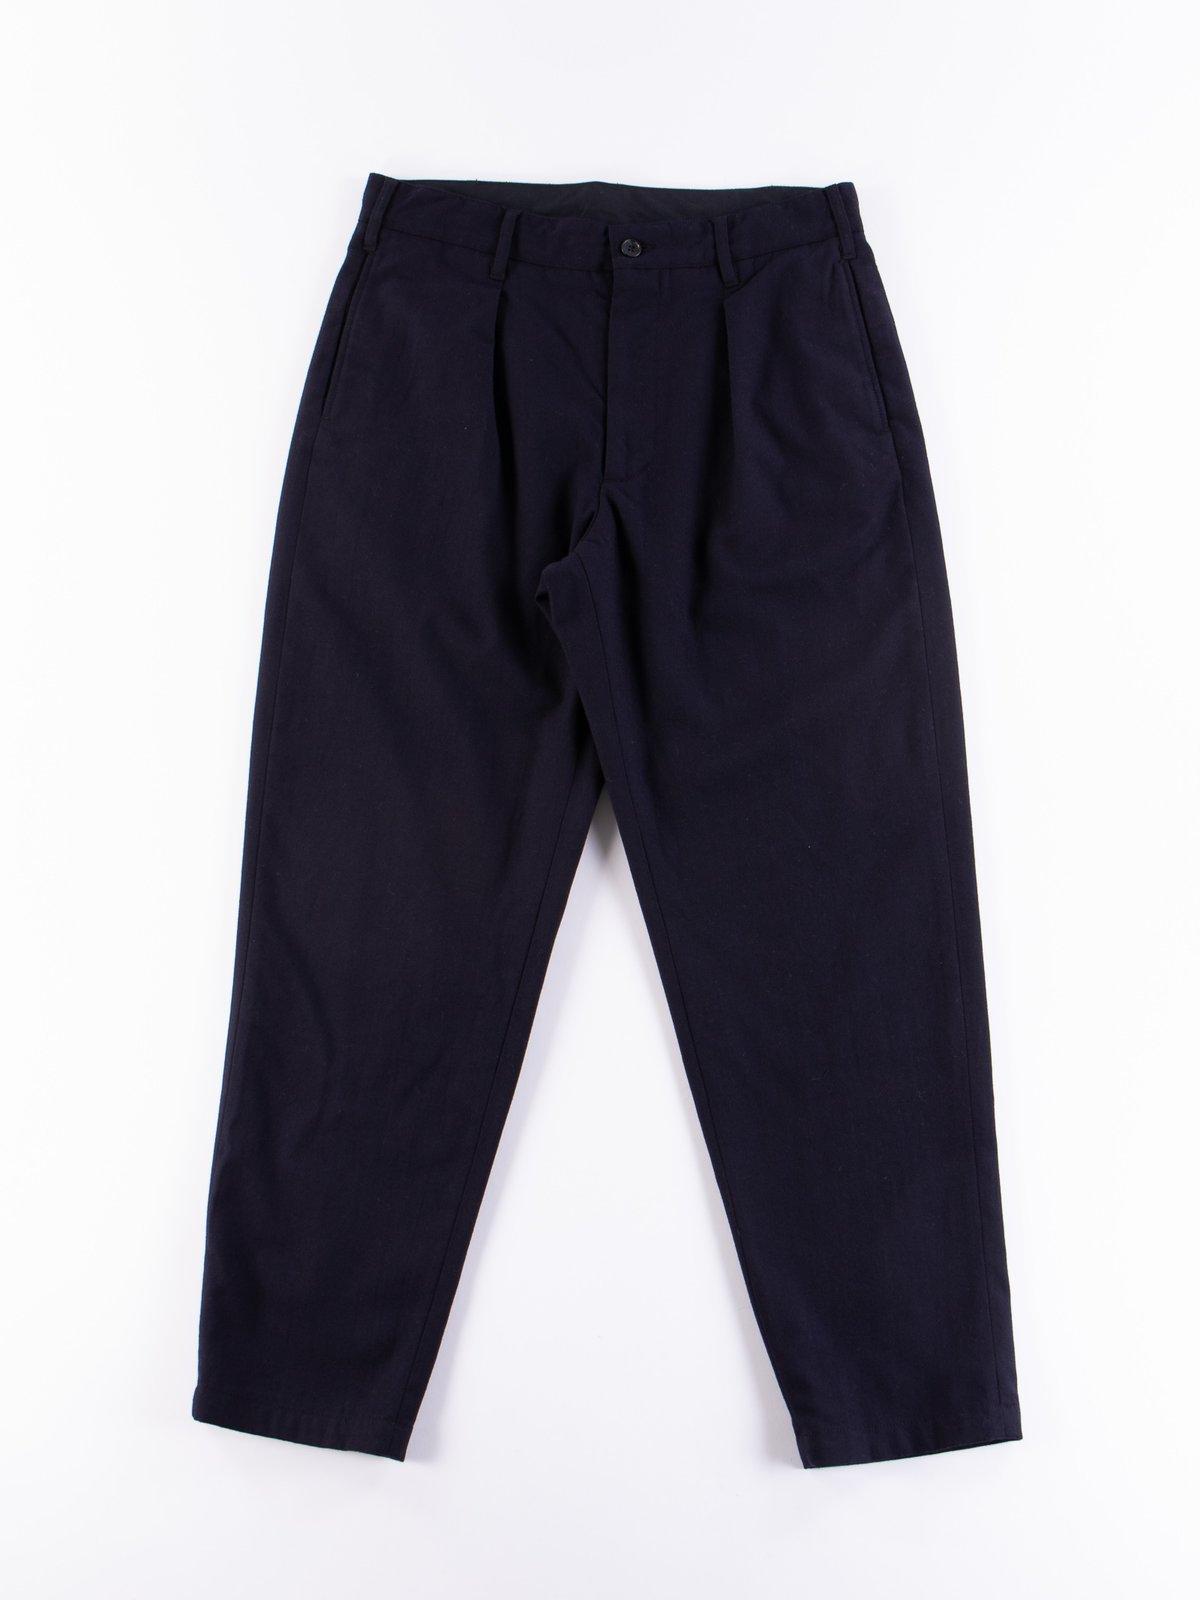 Dark Navy Wool Uniform Serge Carlyle Pant - Image 1